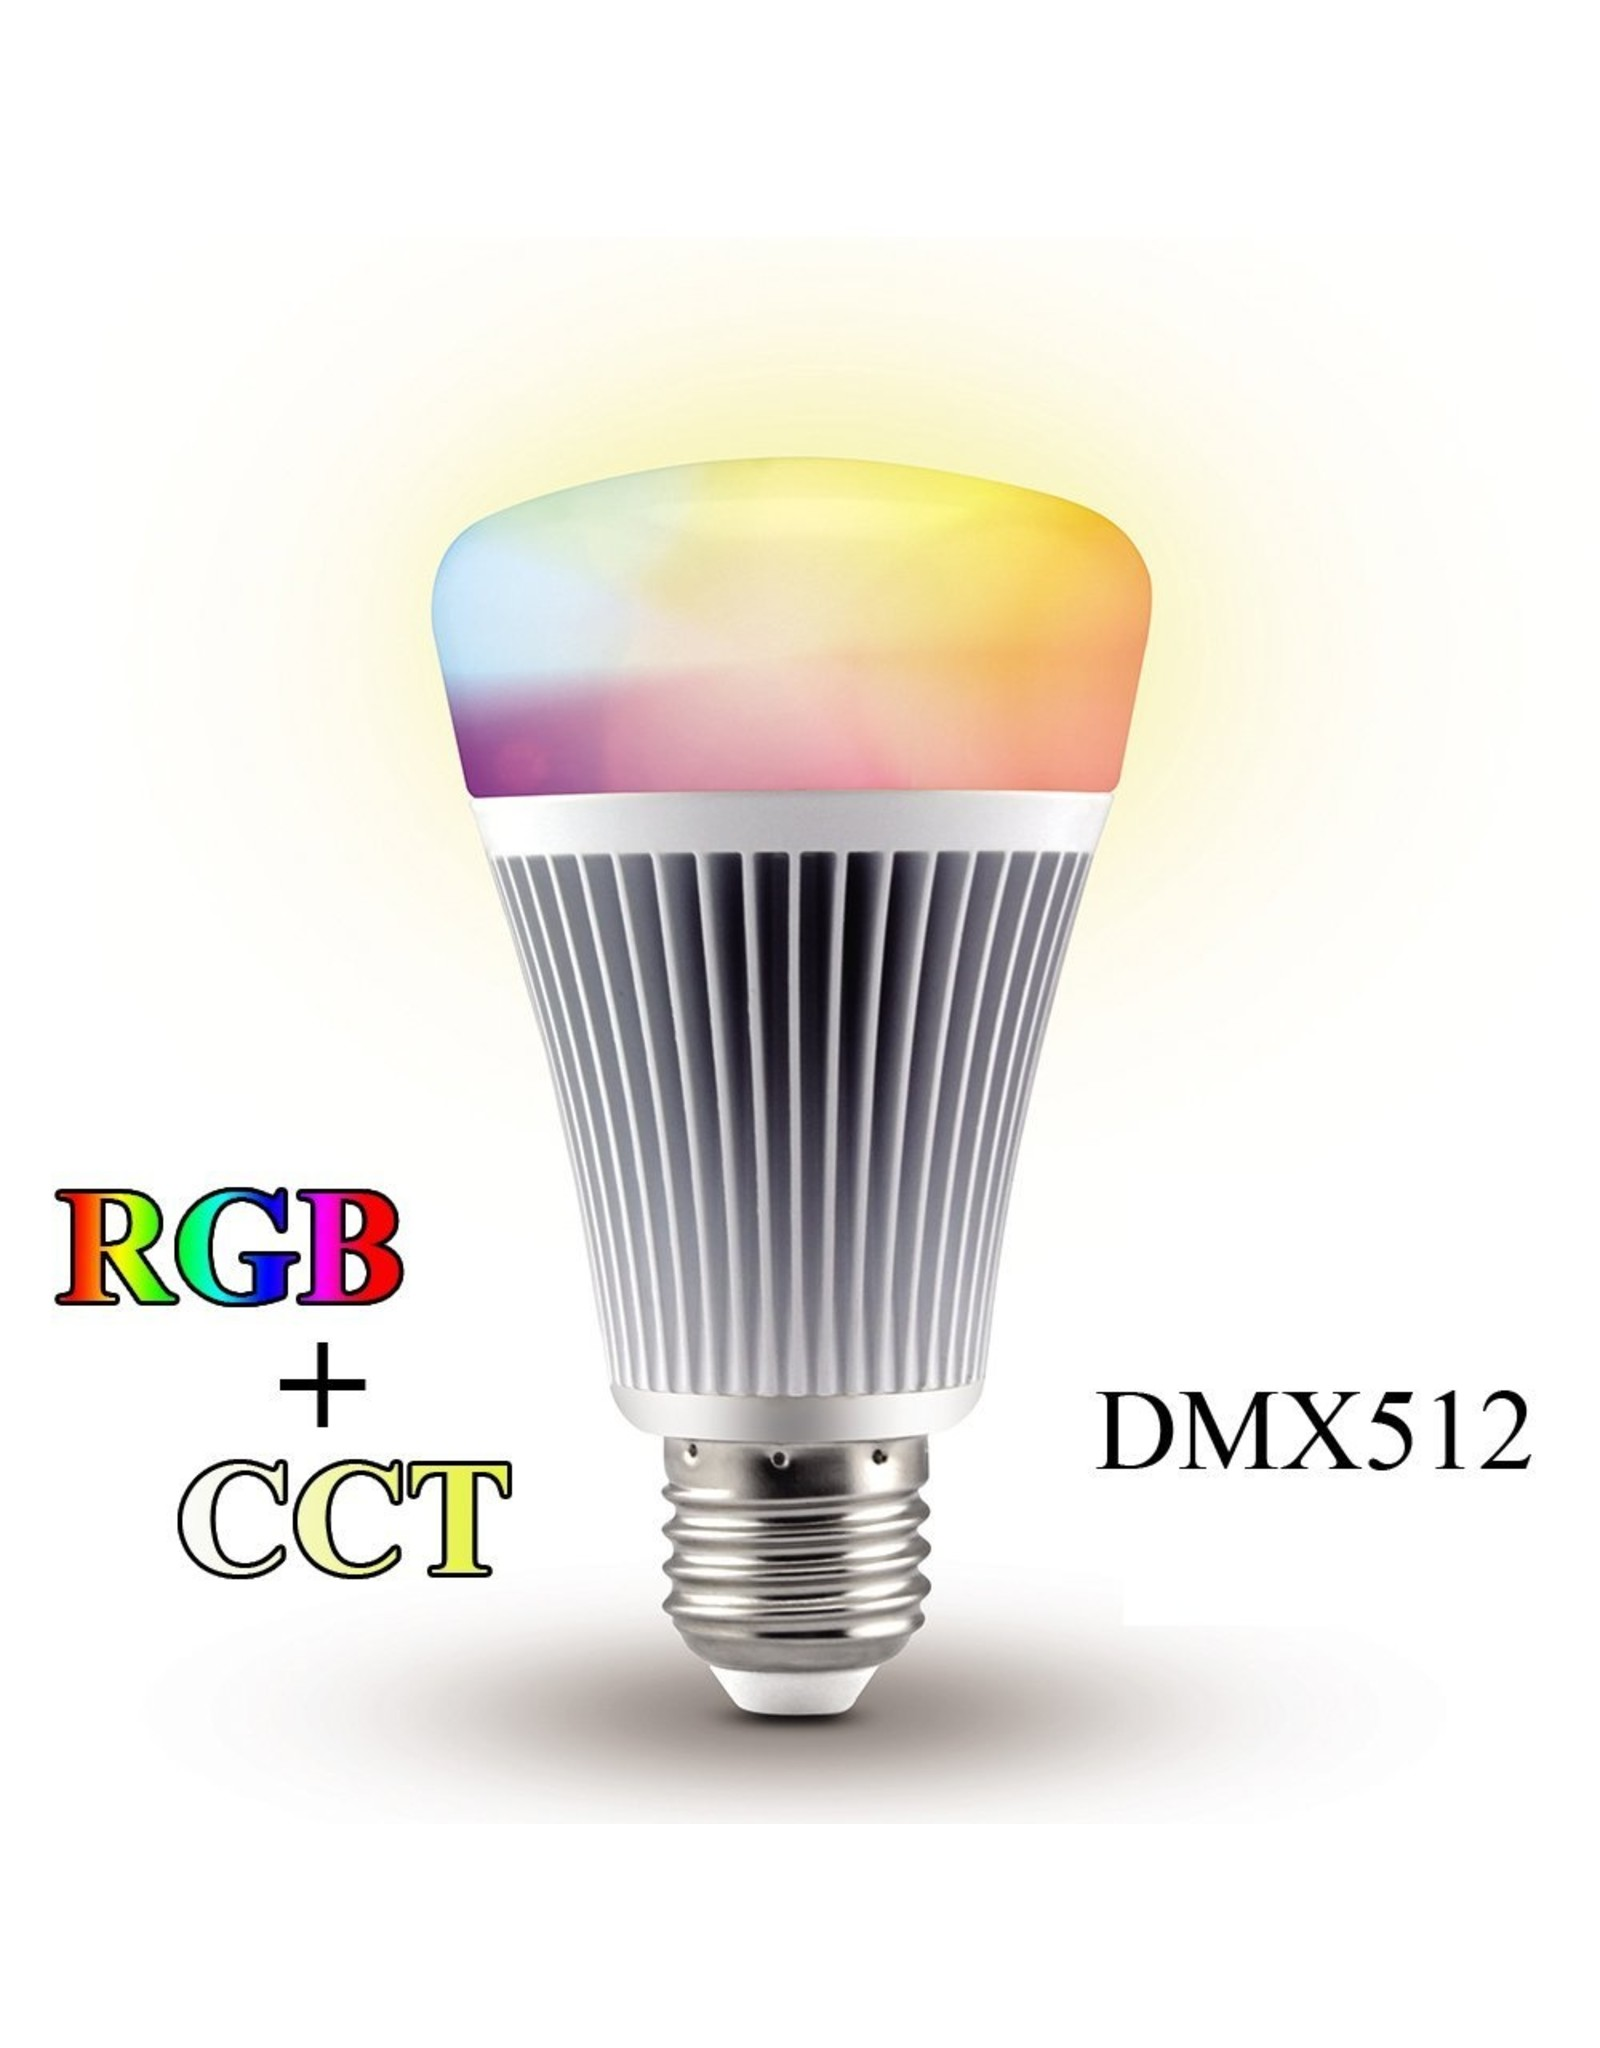 Lights Wireless dmx rgb+cct led lamp - 240v - E27 - angle 220° - 850Lm